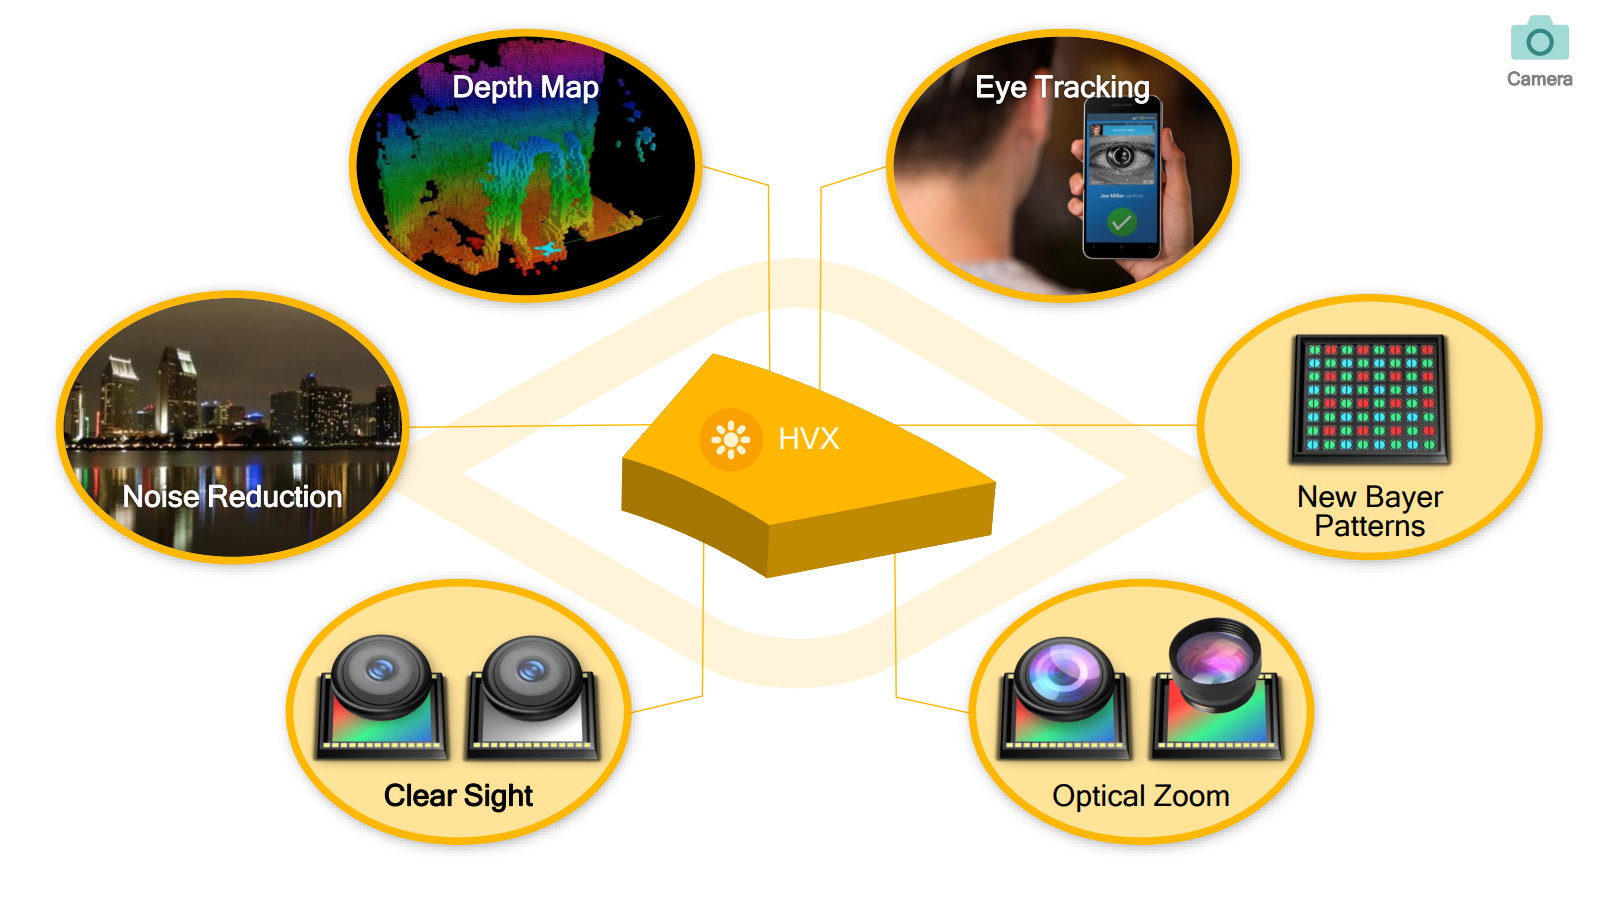 Neuer ISP unterstützt Dual-Kamera-Endgeräte